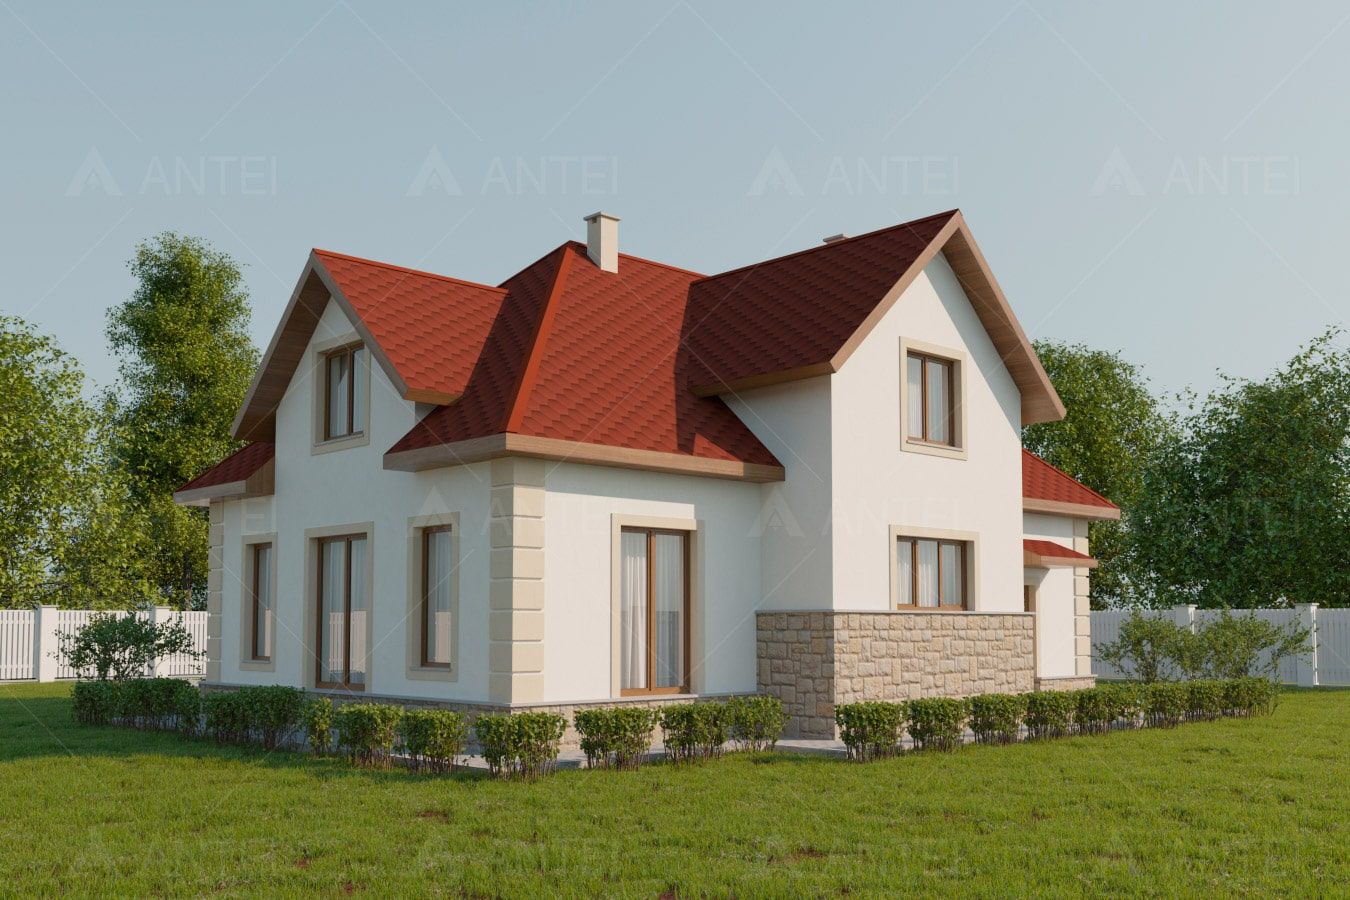 Проект мансардного дома с гаражом «КМ-52» - фото №1